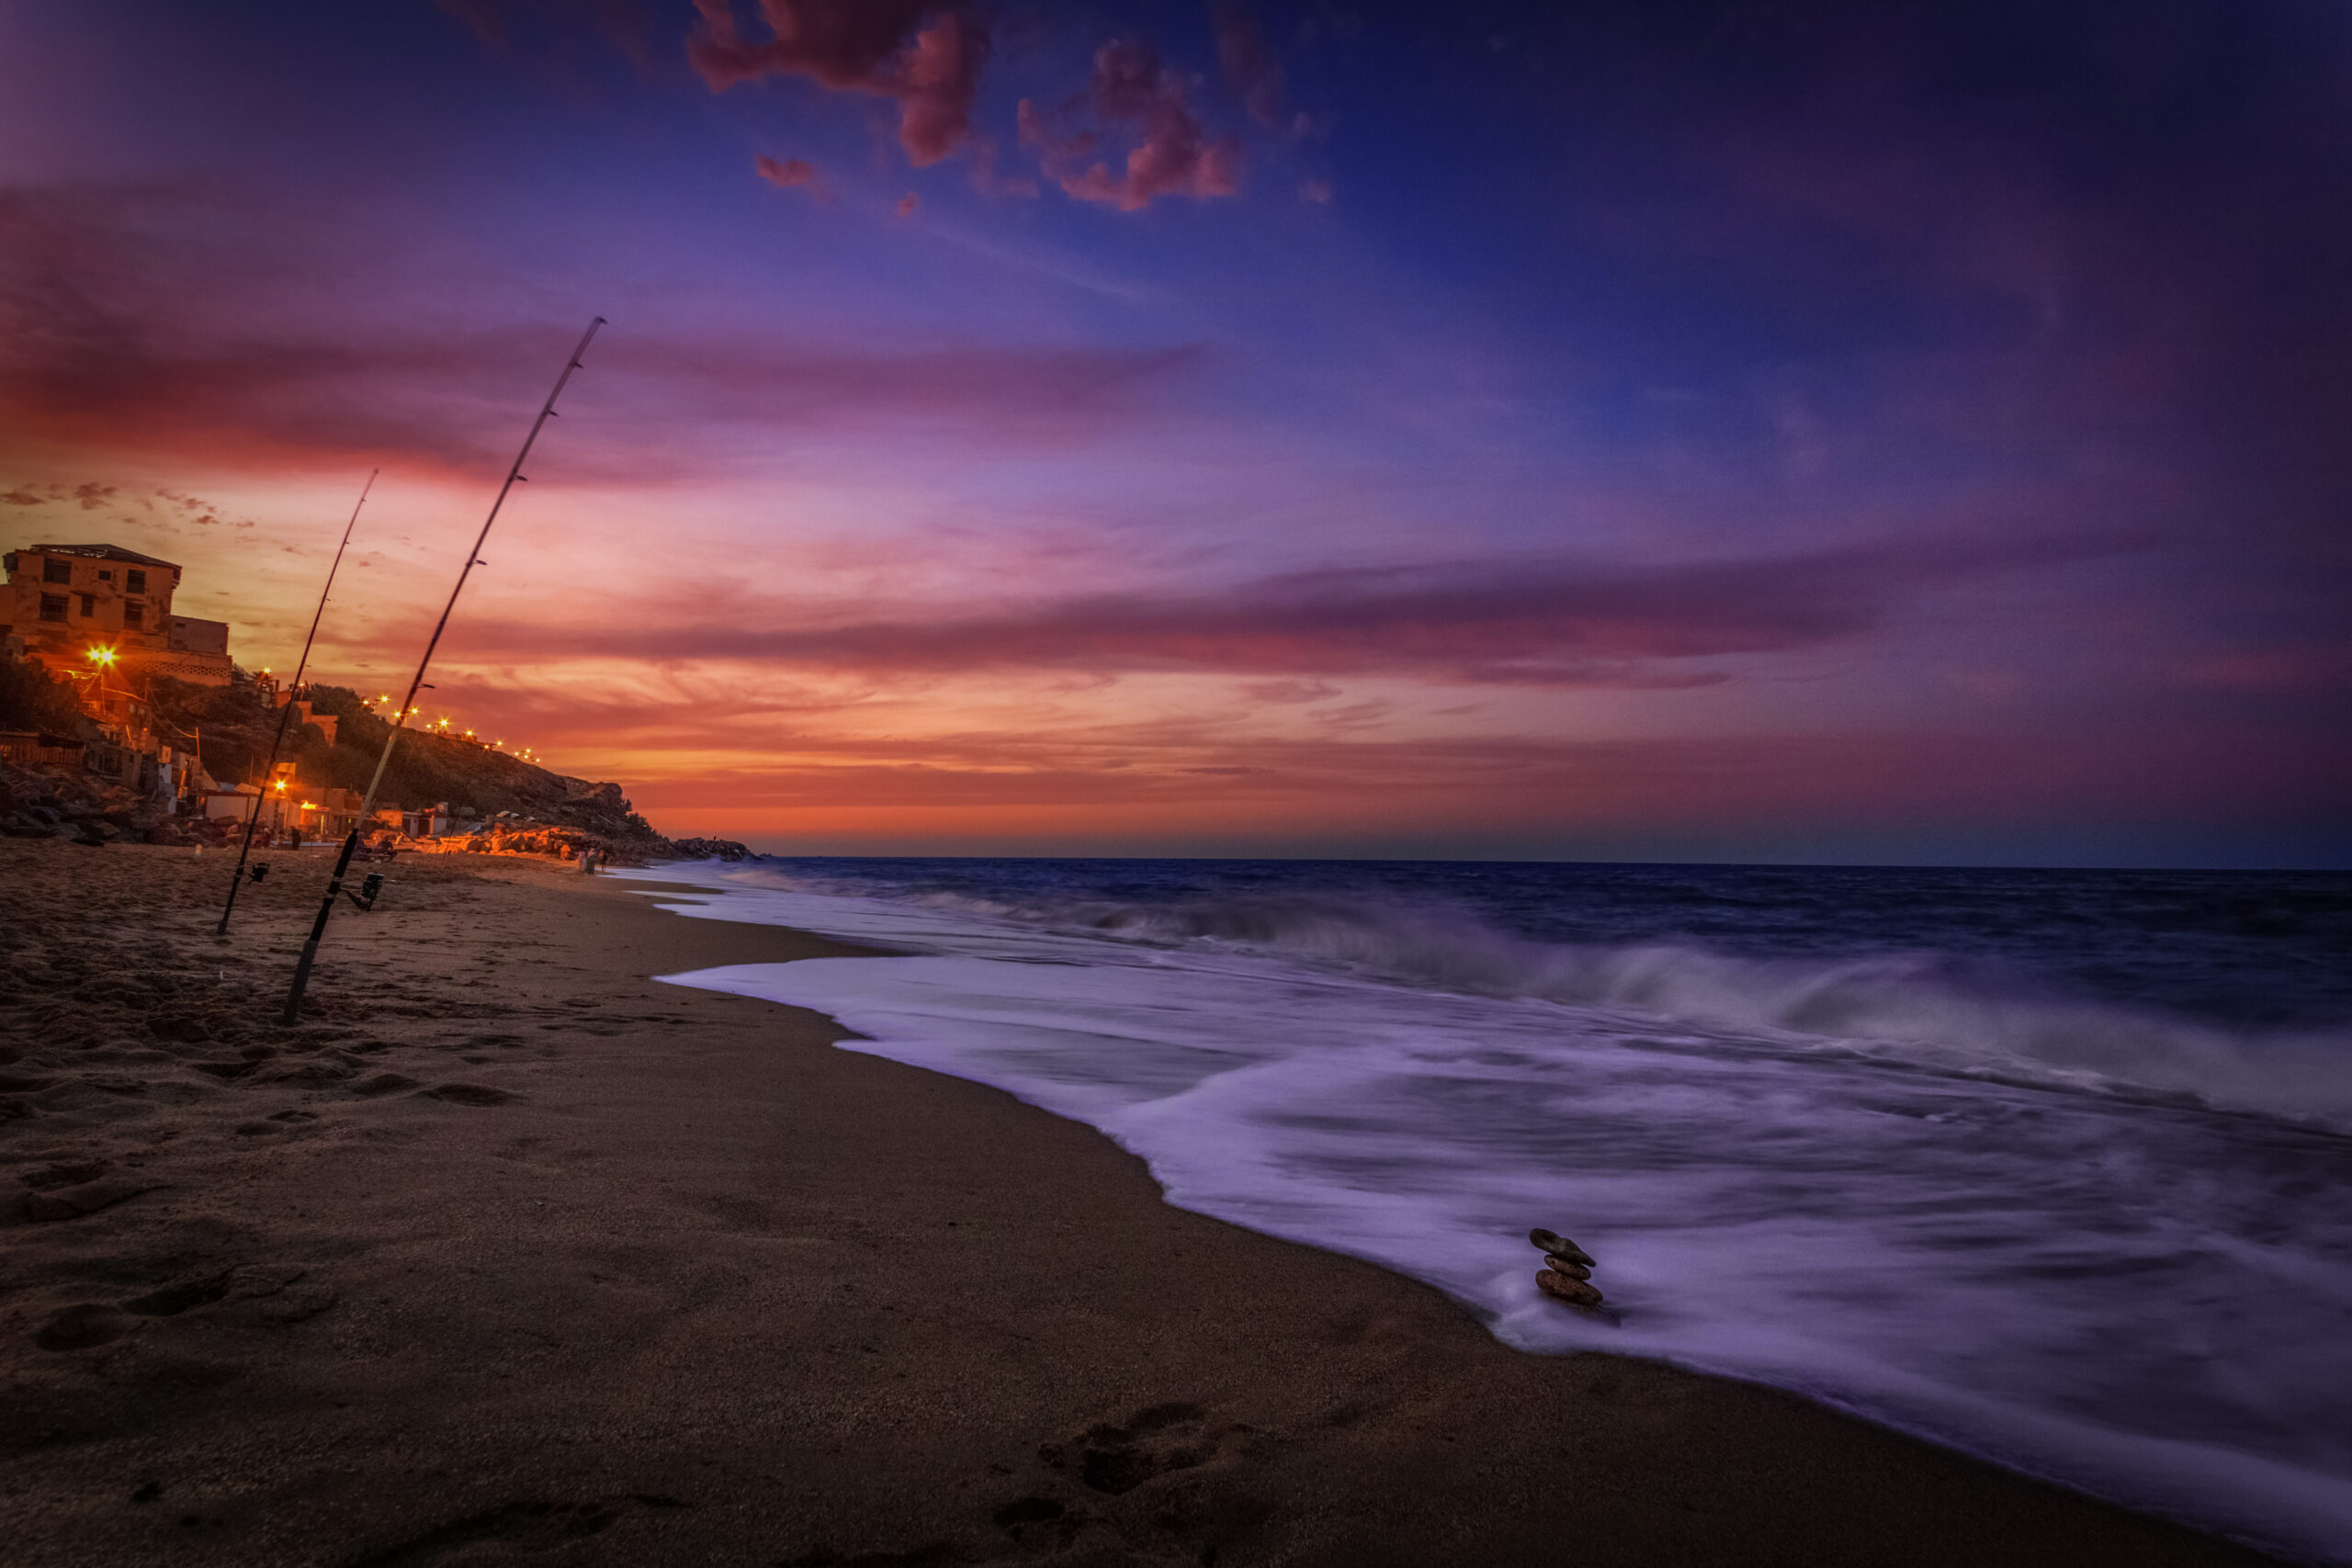 Blue Hour/Twilight photo of a beach, the ocean and dark-red and blue skies at Aïn Taya beach, Algeria